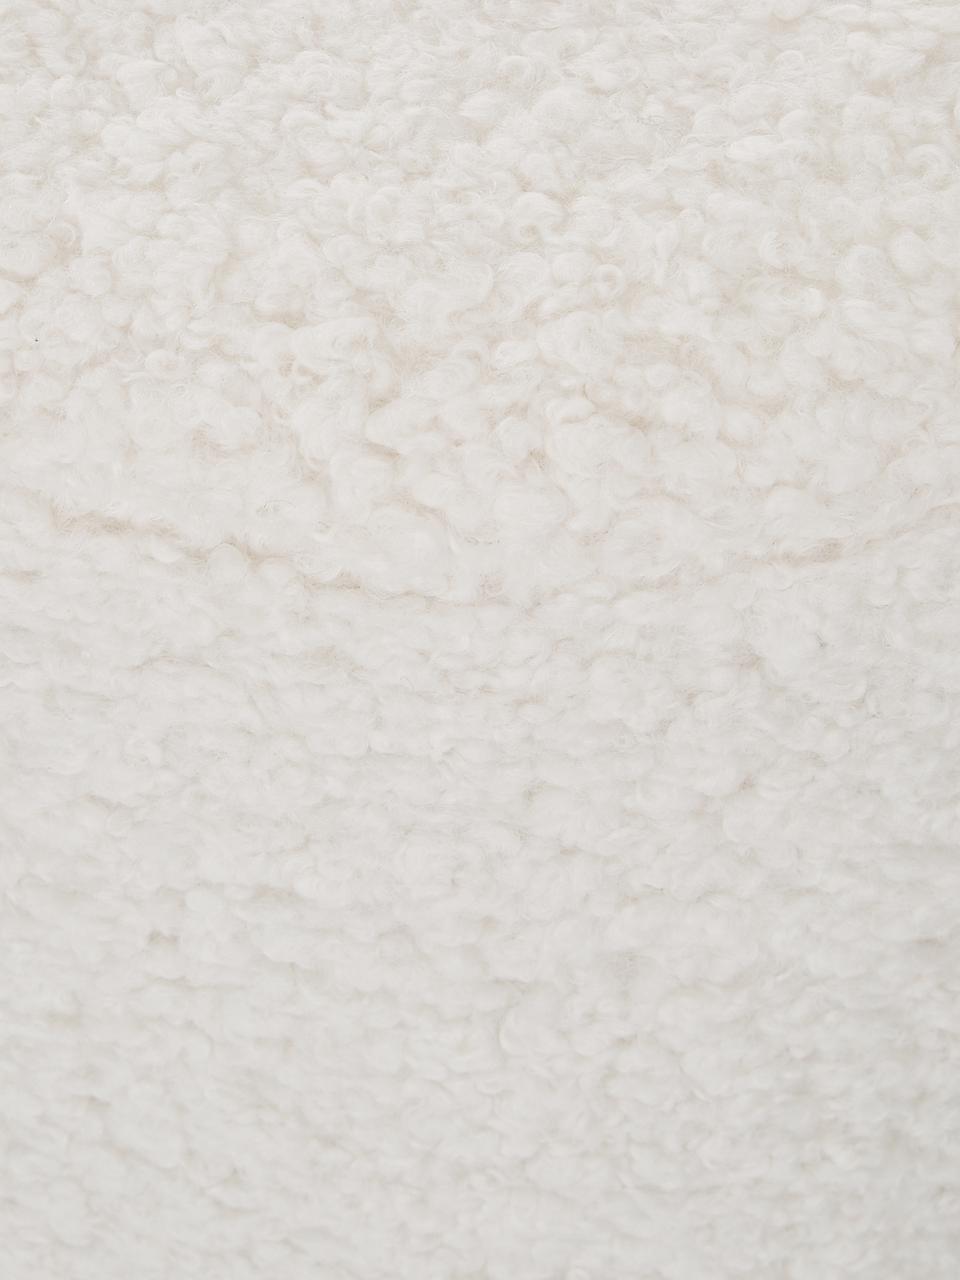 Teddy-Hocker Daisy, Bezug: Polyester (Teddyfell) 40., Rahmen: Sperrholz, Teddy Cremeweiß, Ø 38 x H 45 cm